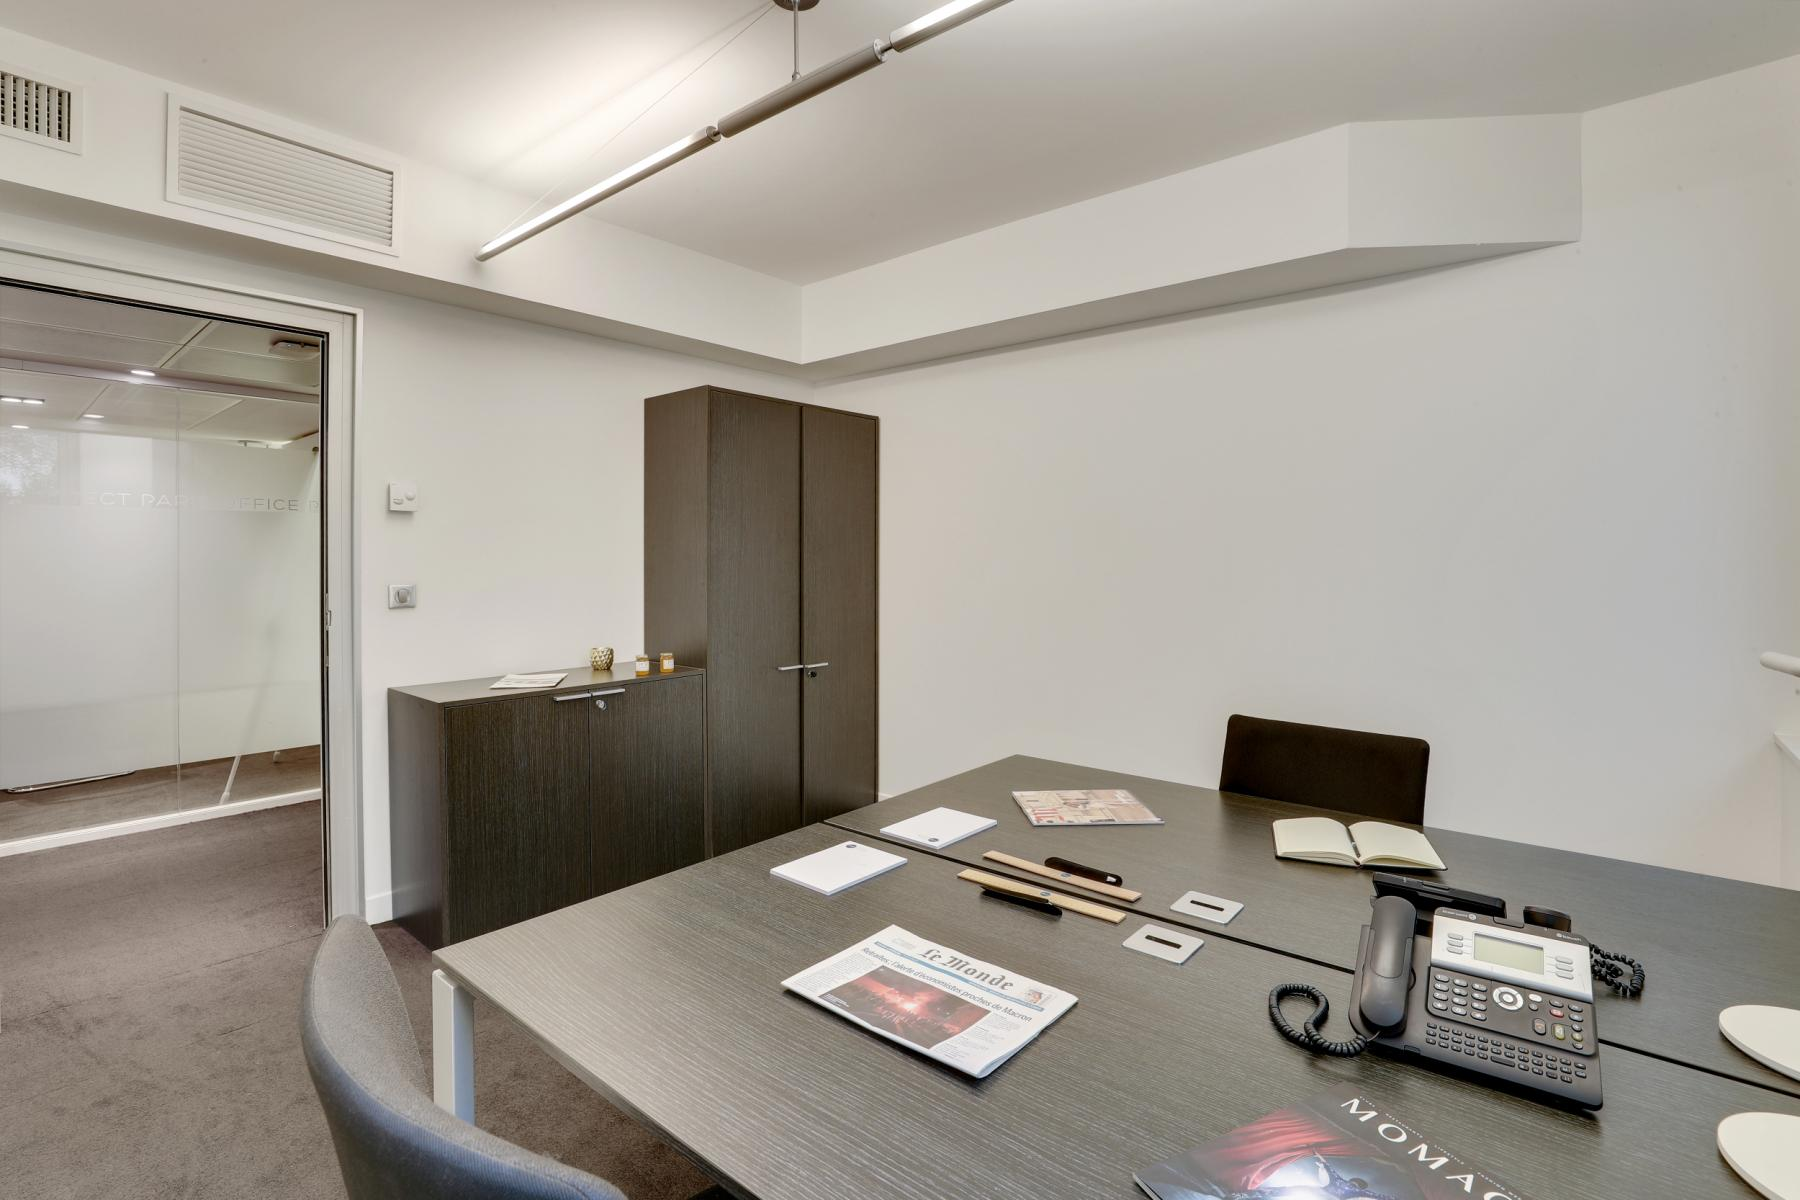 Location bureau Rue Quentin-Bauchart 20, Paris (3)